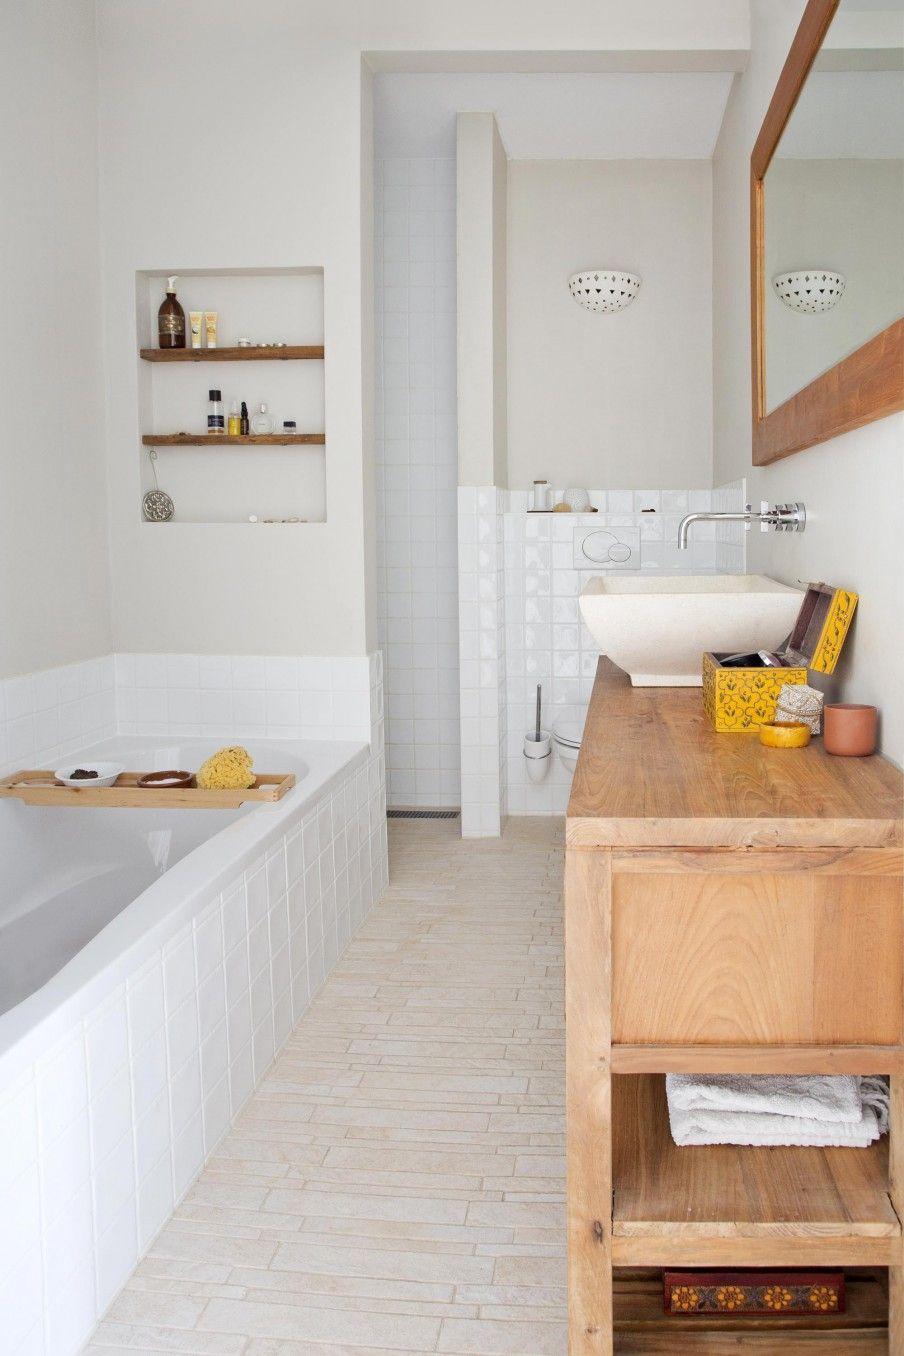 16-witte-badkamer-hout | | BADKAMER | | Pinterest - Badkamer, Hout ...